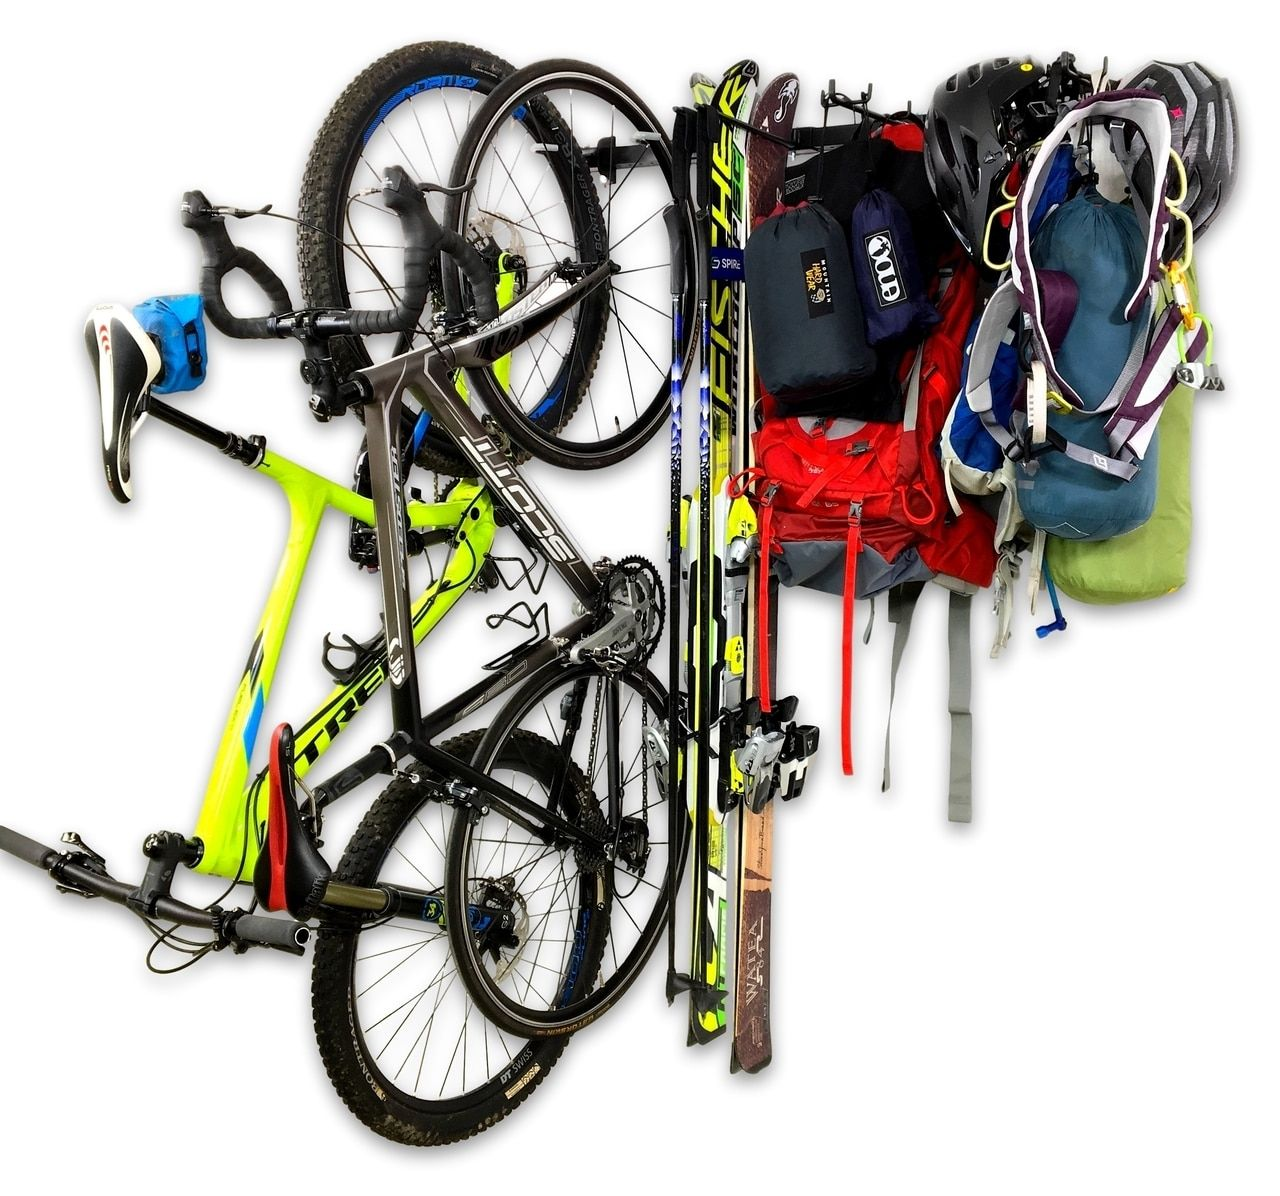 Adventure Gear Storage Rack Holds Bikes Skis Camping